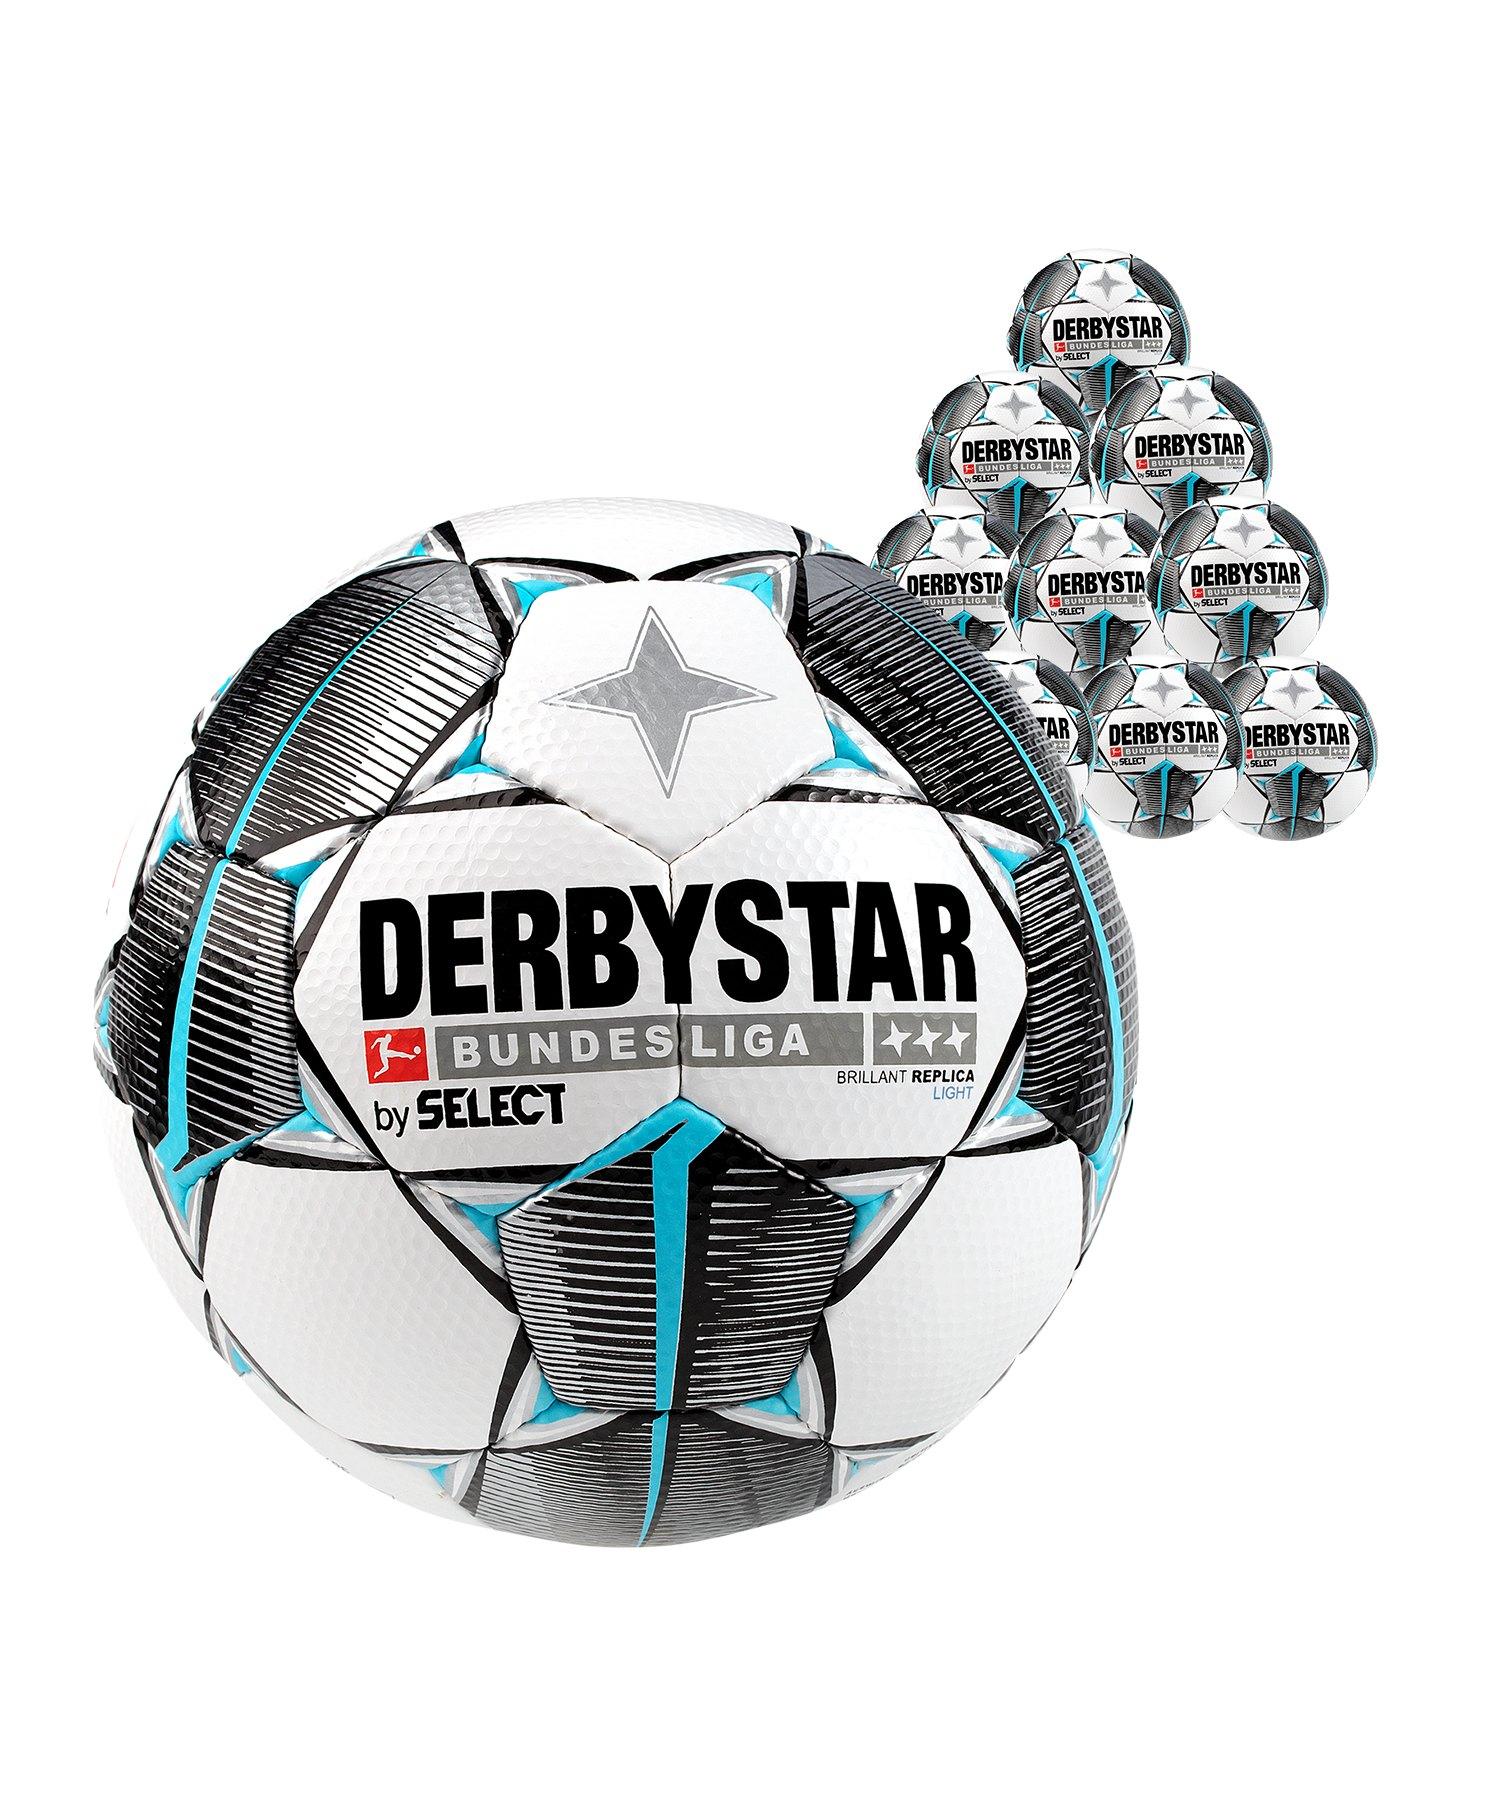 Derbystar Bundesliga Bril. Replica Light 50x Gr.4 Weiss F019 - weiss